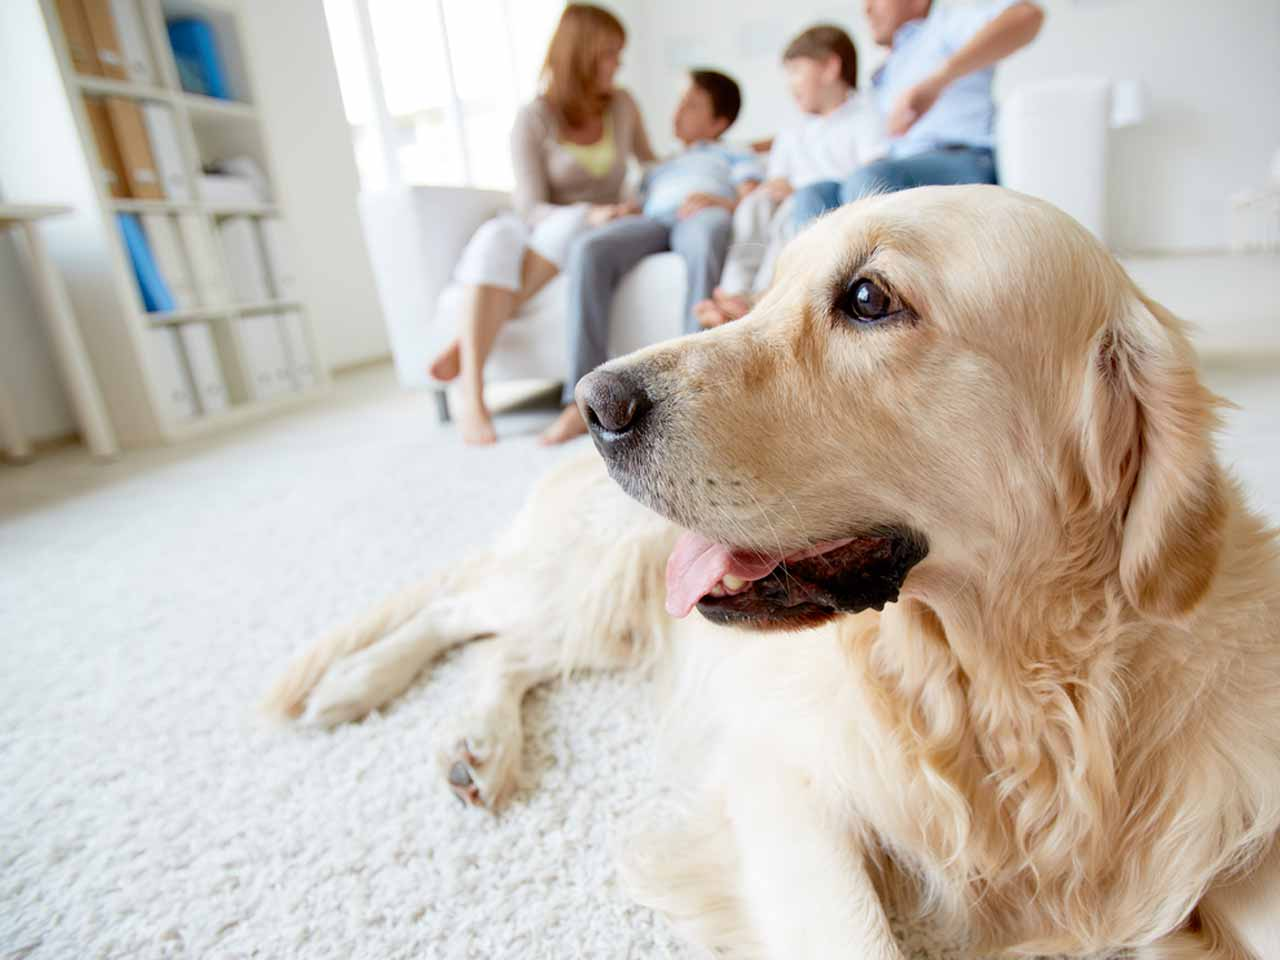 Enjoyable The Best Dog Friendly Cottages Saga Download Free Architecture Designs Embacsunscenecom